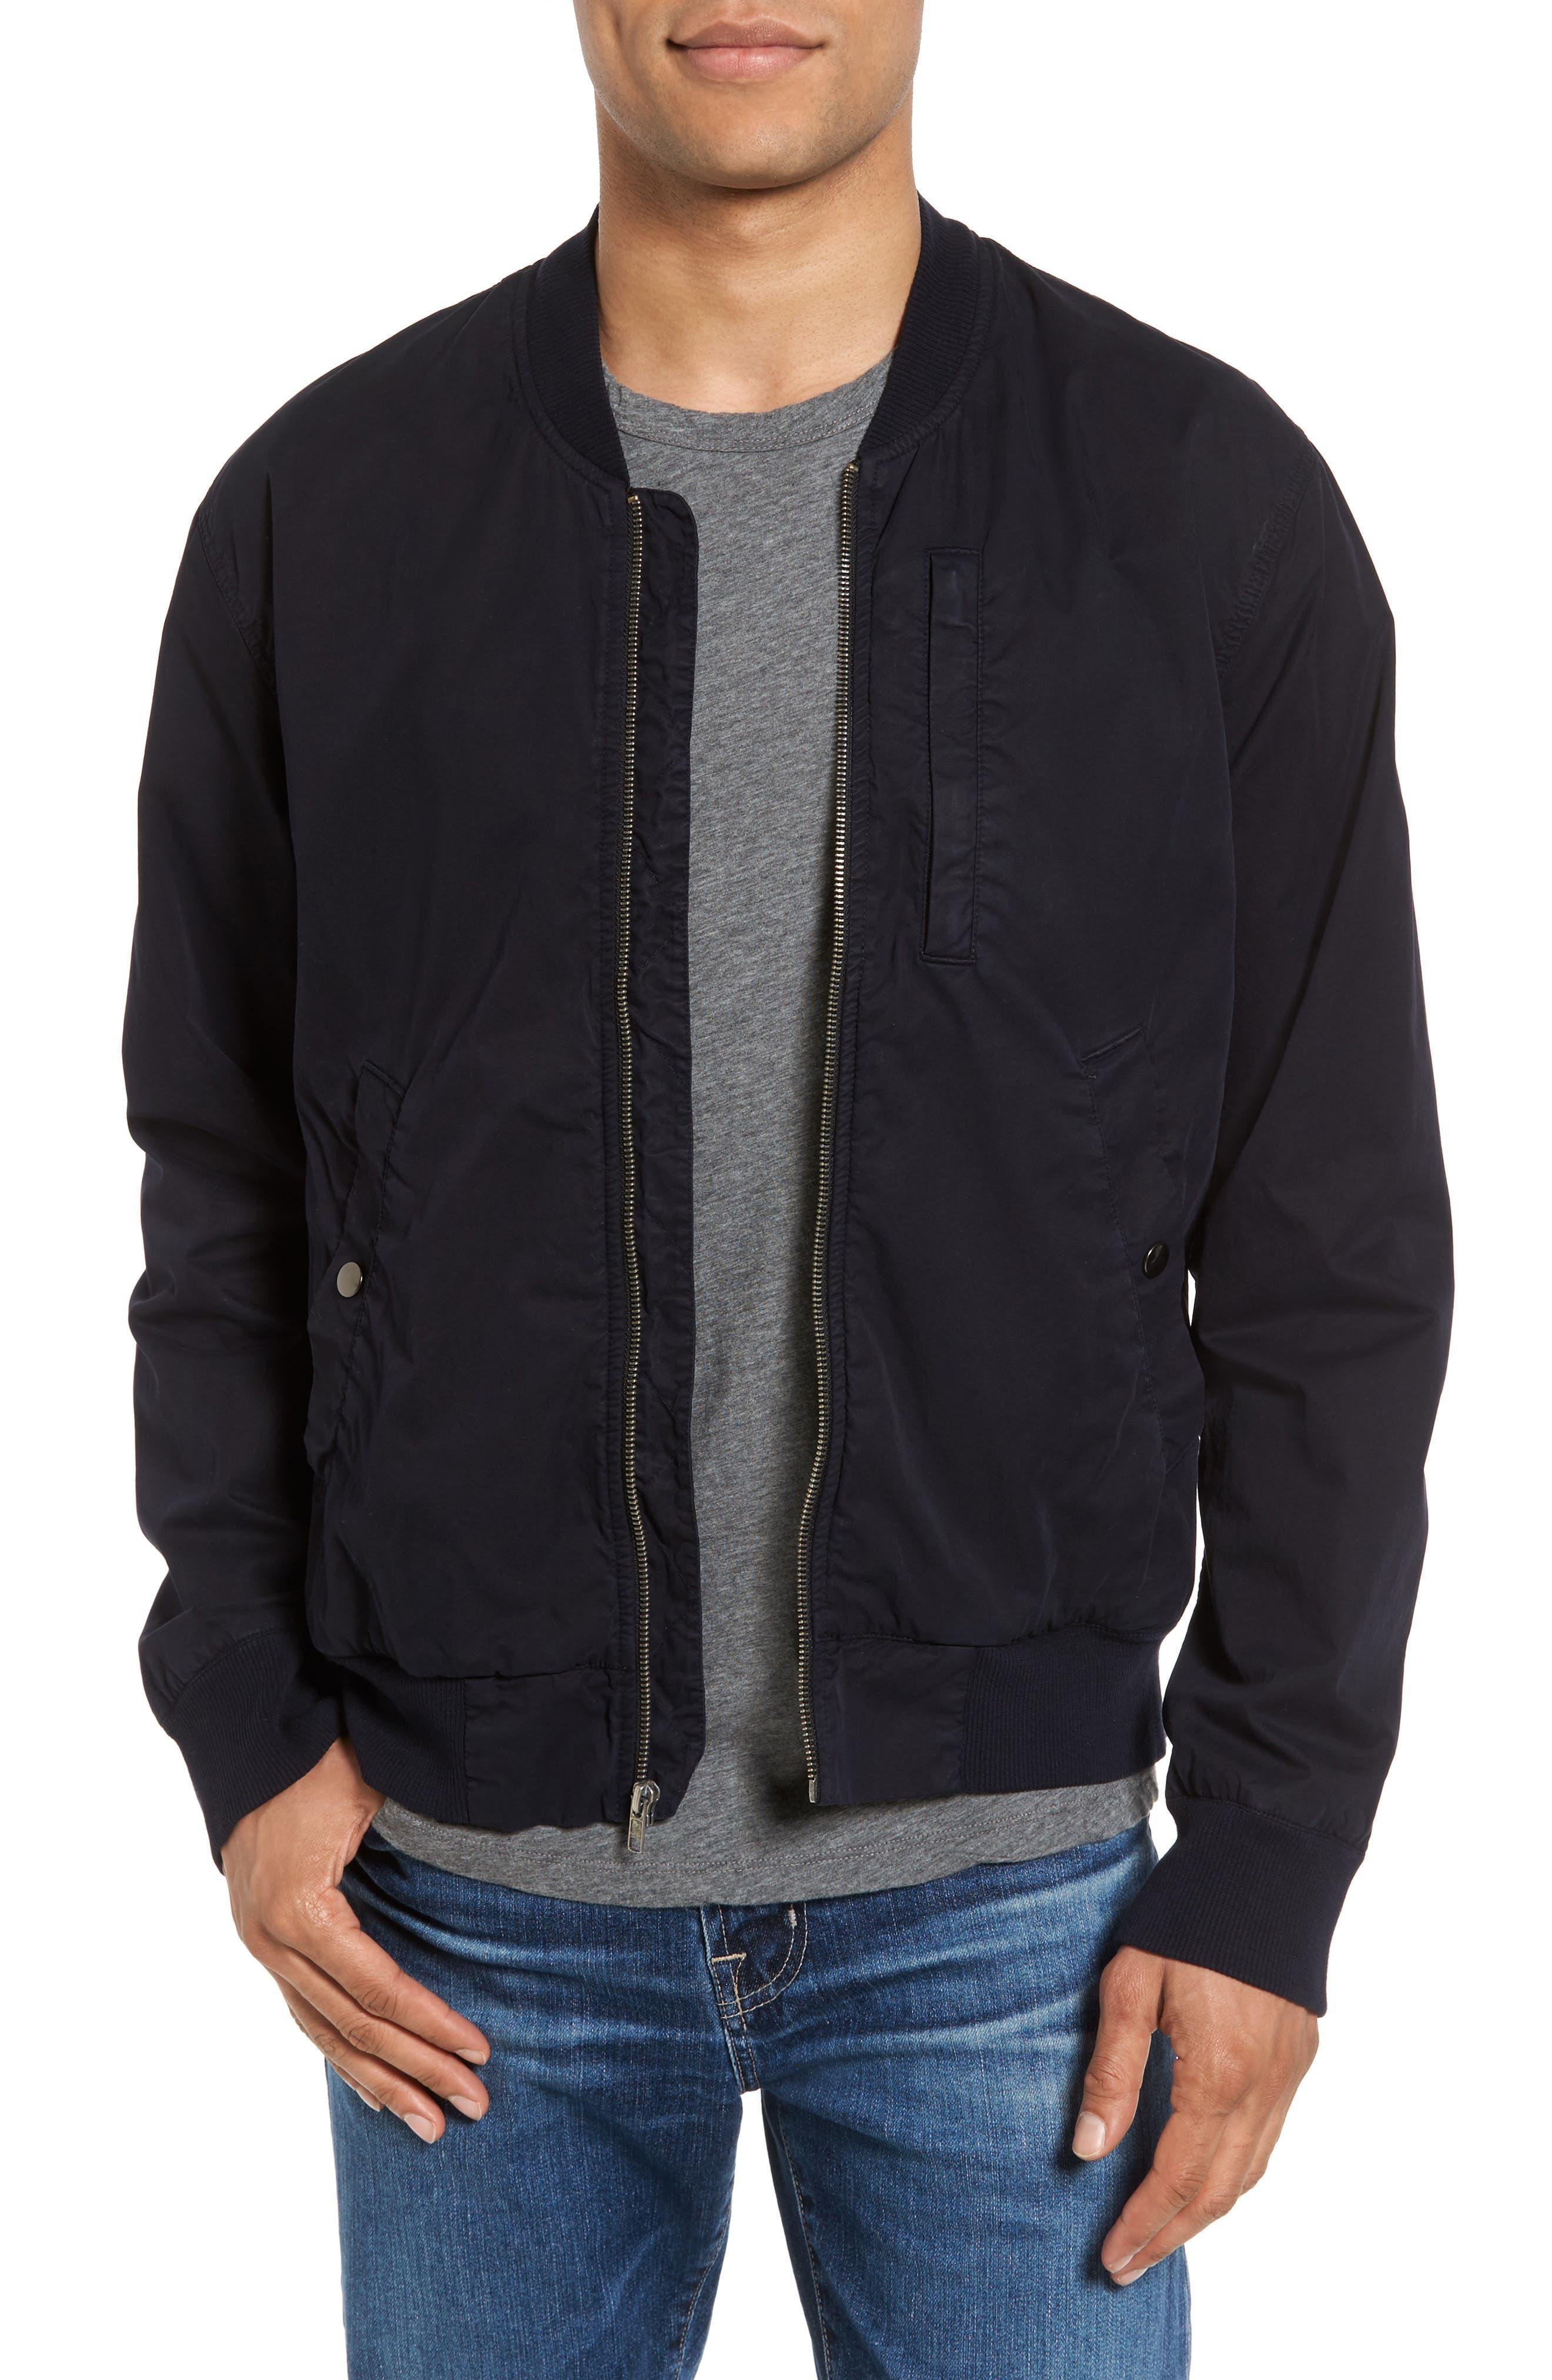 James Perse Cotton Bomber Jacket